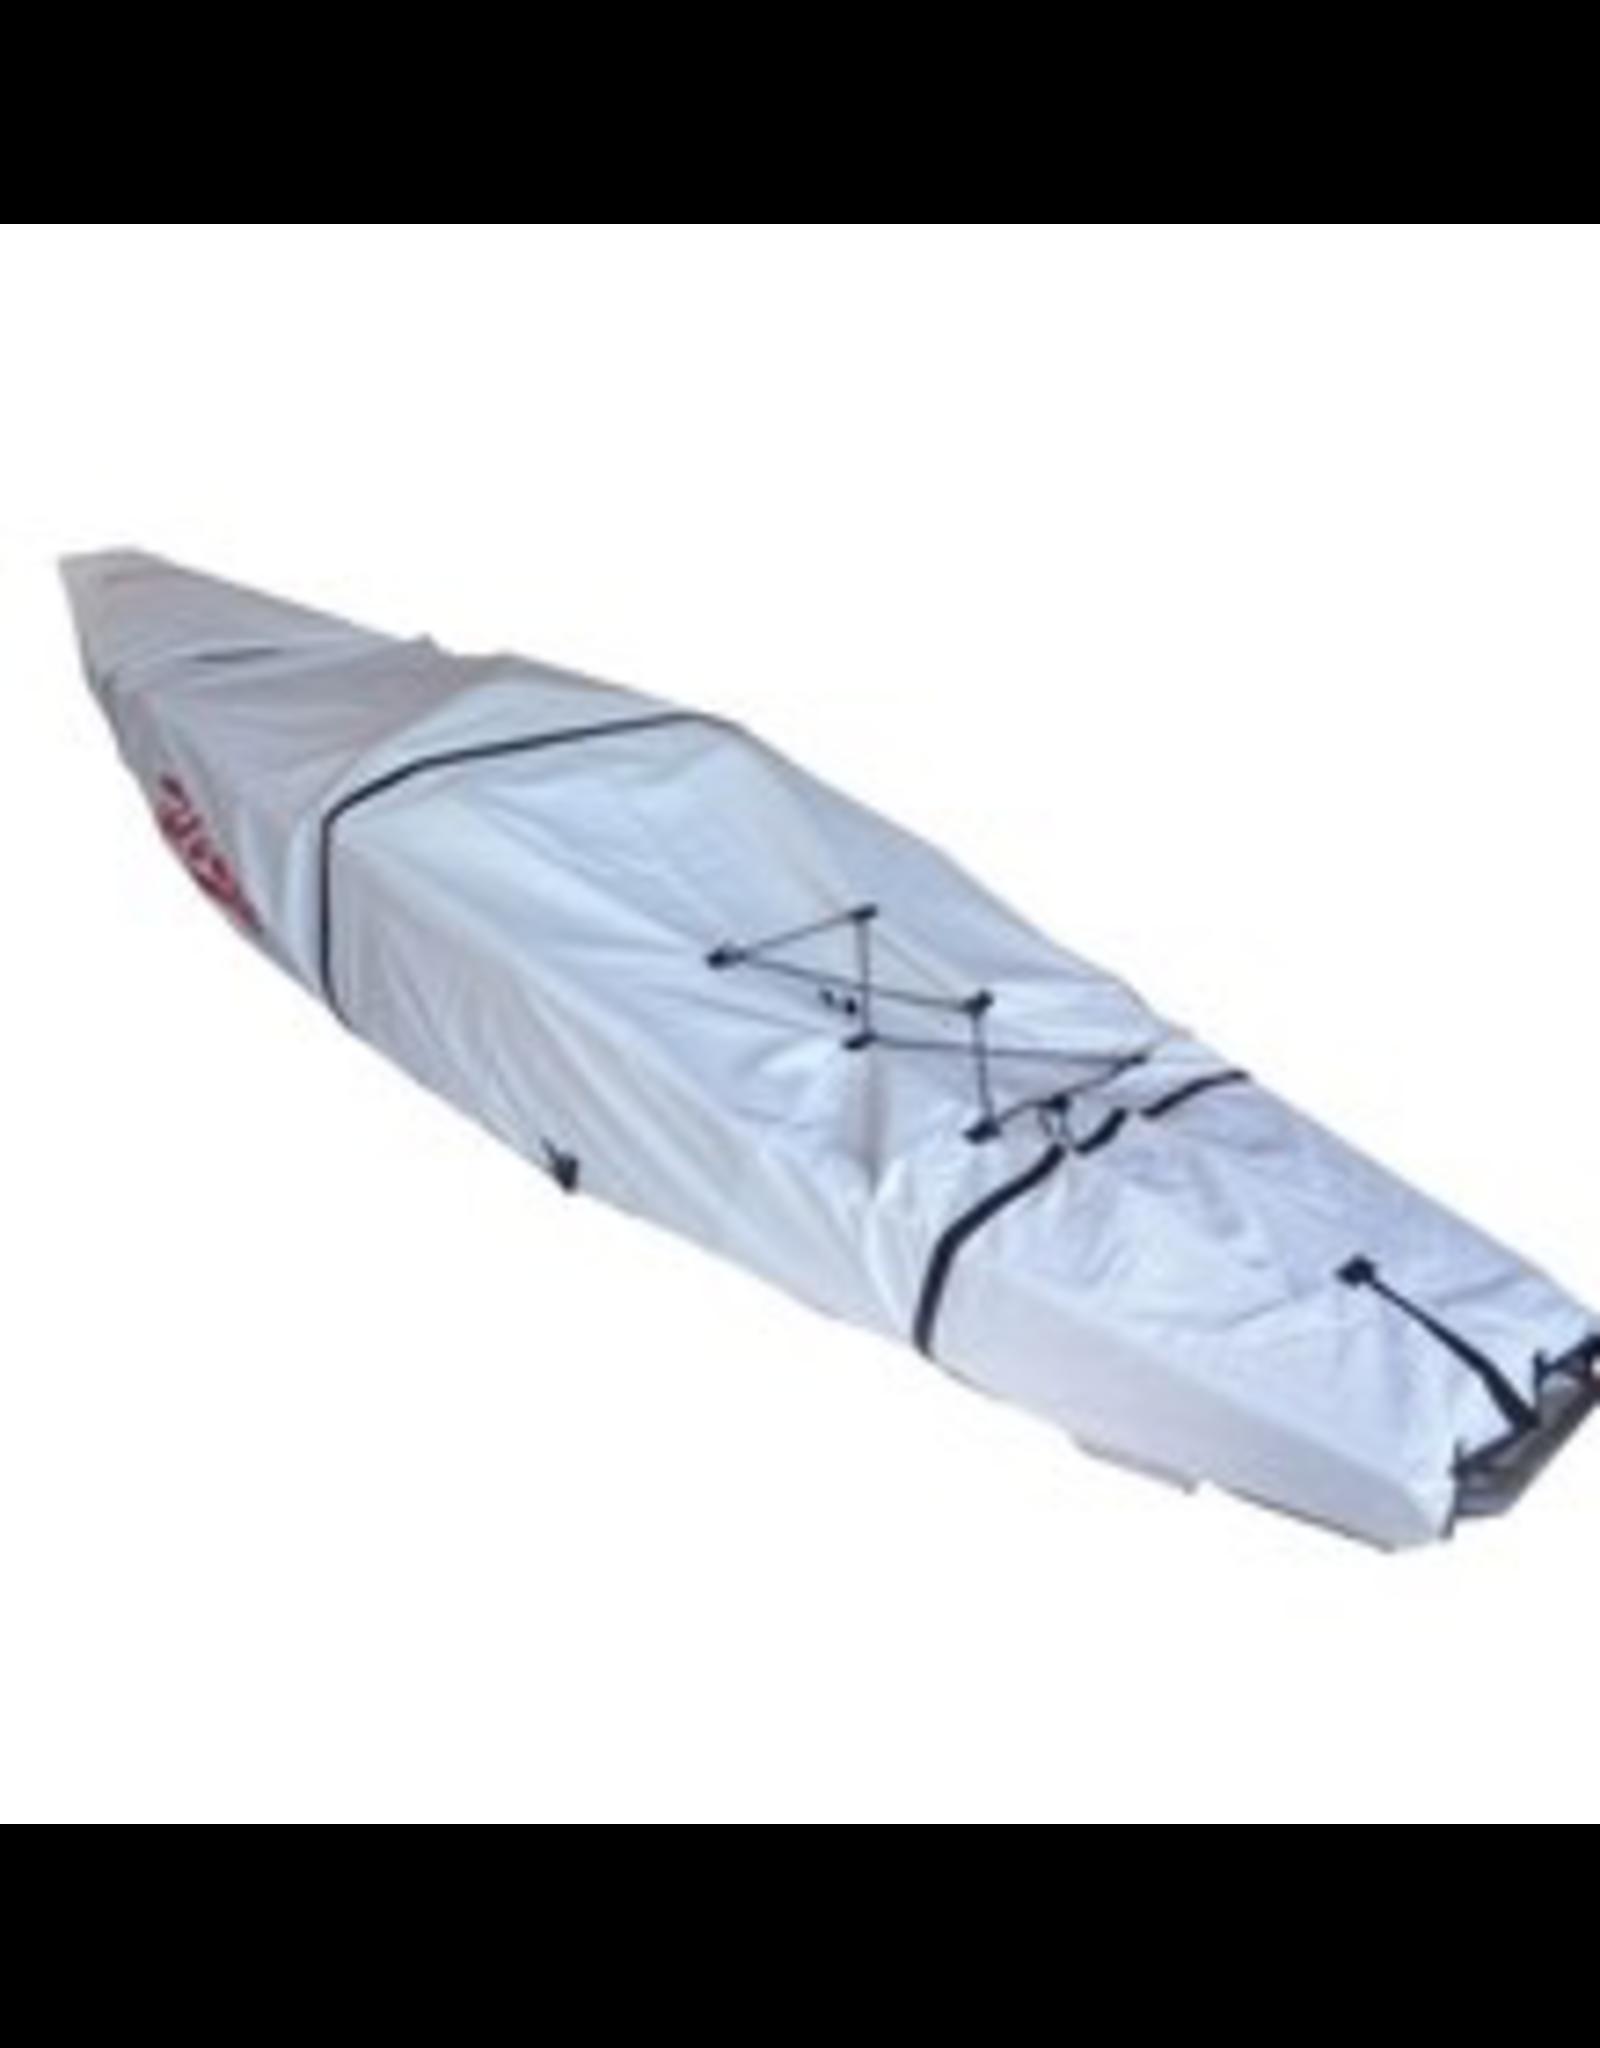 Hobie Hobie Kayak Cover for Hobie Pro Angler 12 Kayaks